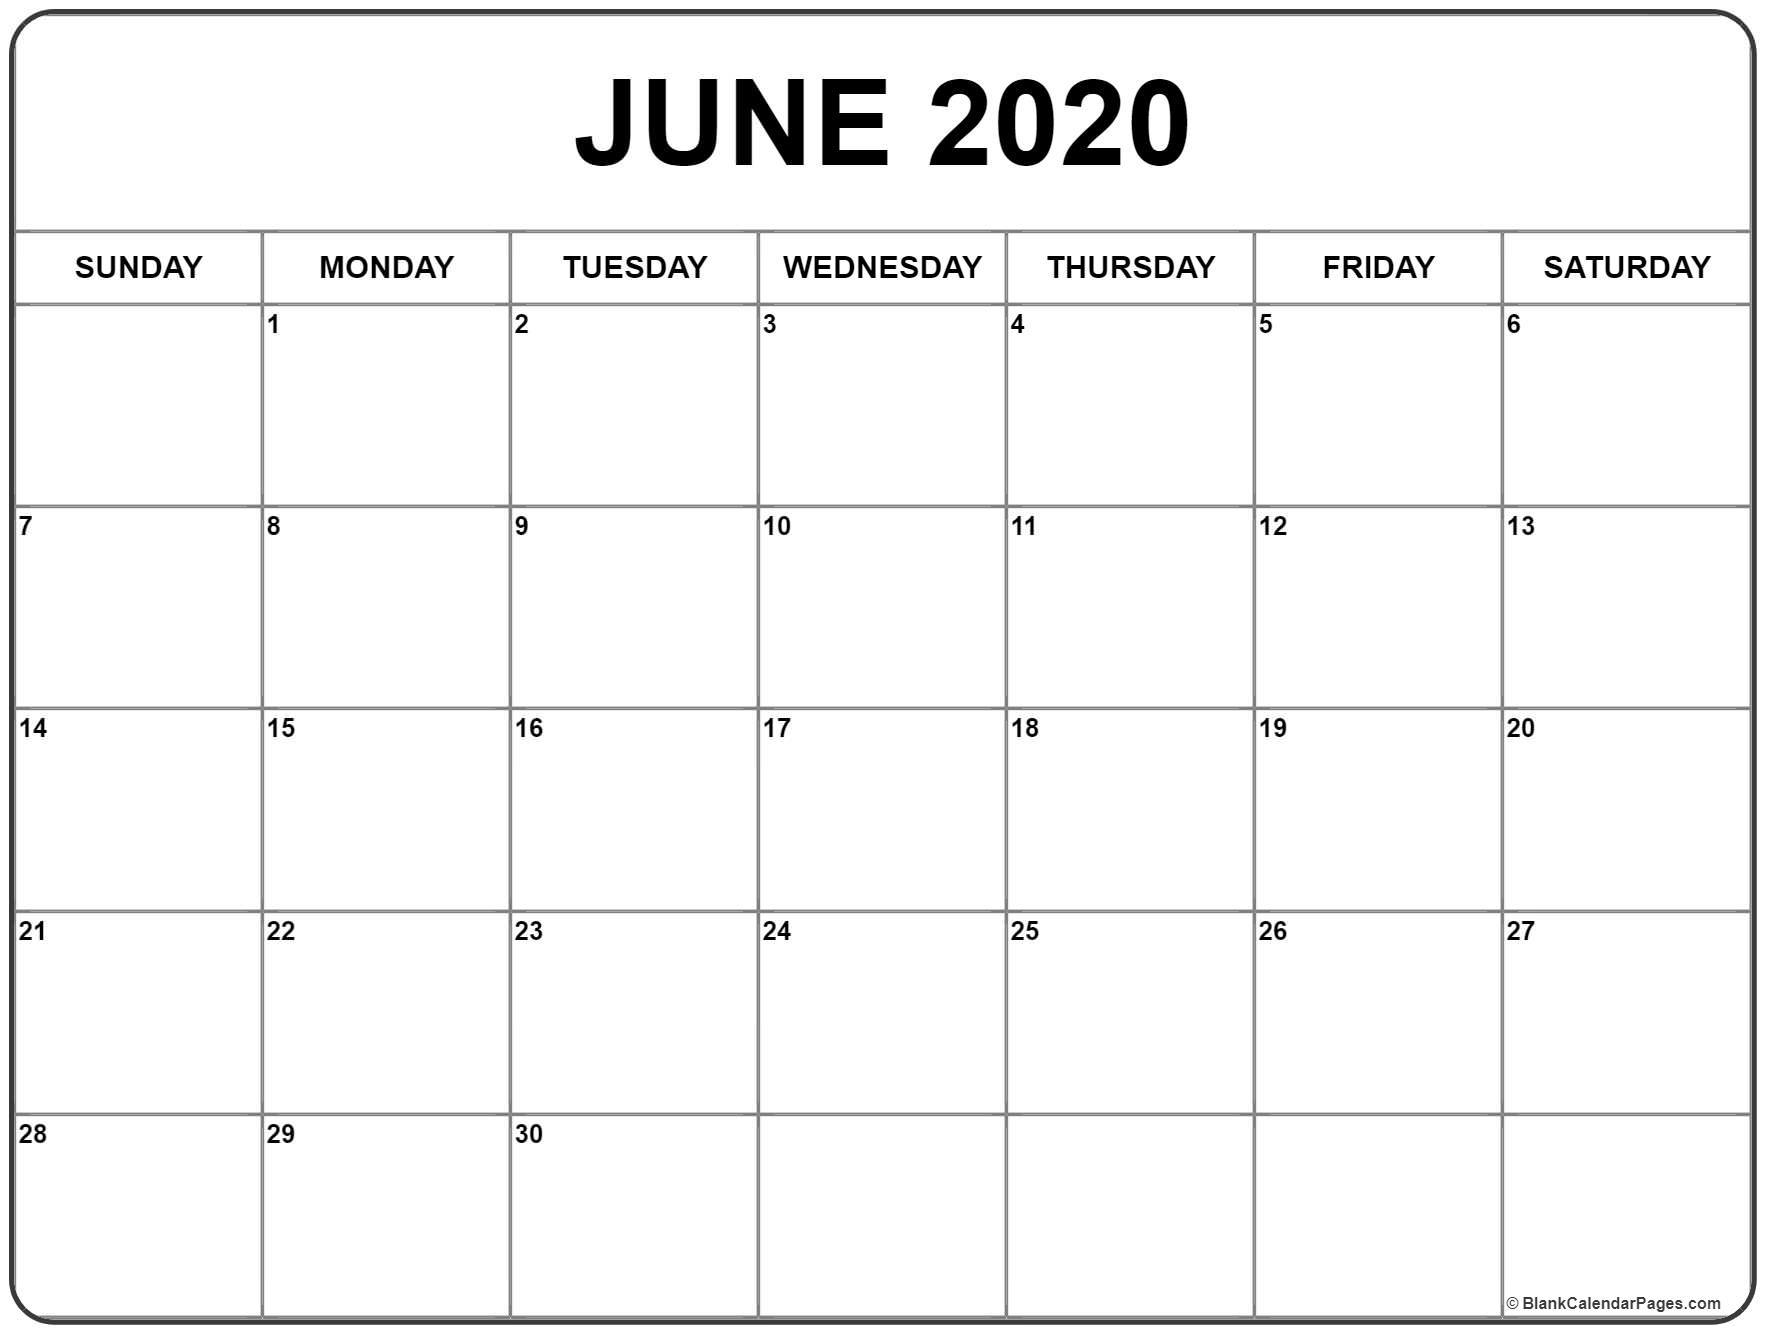 June 2020 Calendar | Free Printable Monthly Calendars intended for Free Printable Calendar For 2020 With No Download